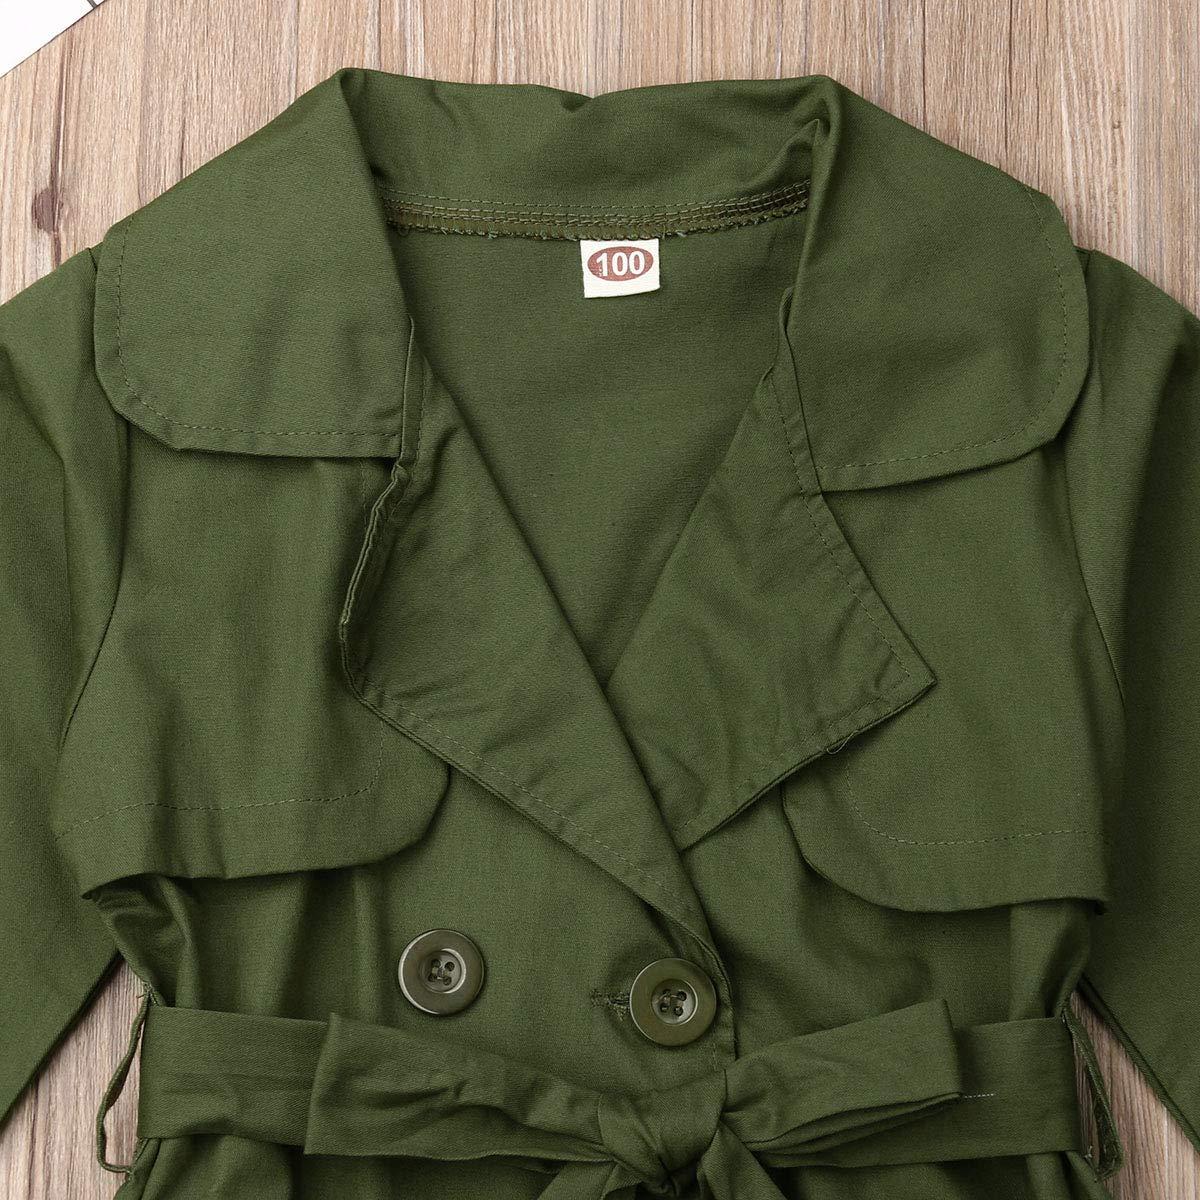 Merqwadd Toddler Kids Girls Double Breasted Belt Windbreaker Jacket Trench Coat Fall Outwear Clothes